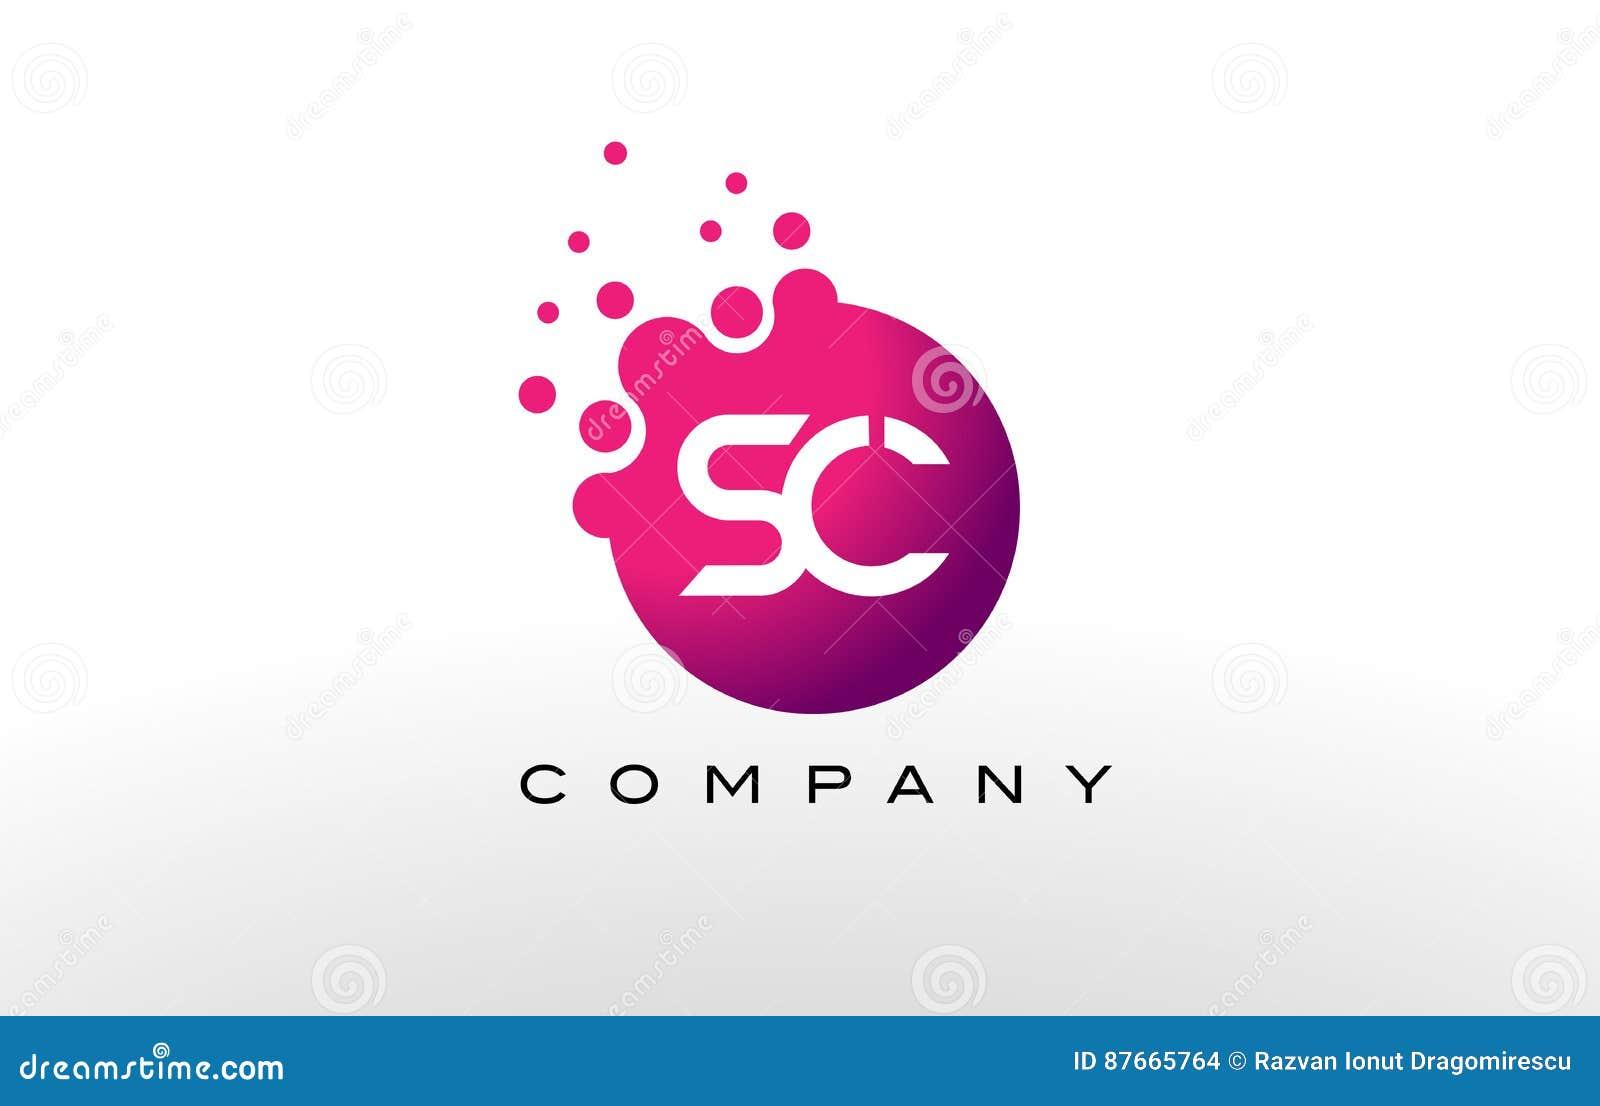 Sc Letter Dots Logo Design With Creative Trendy Bubbles